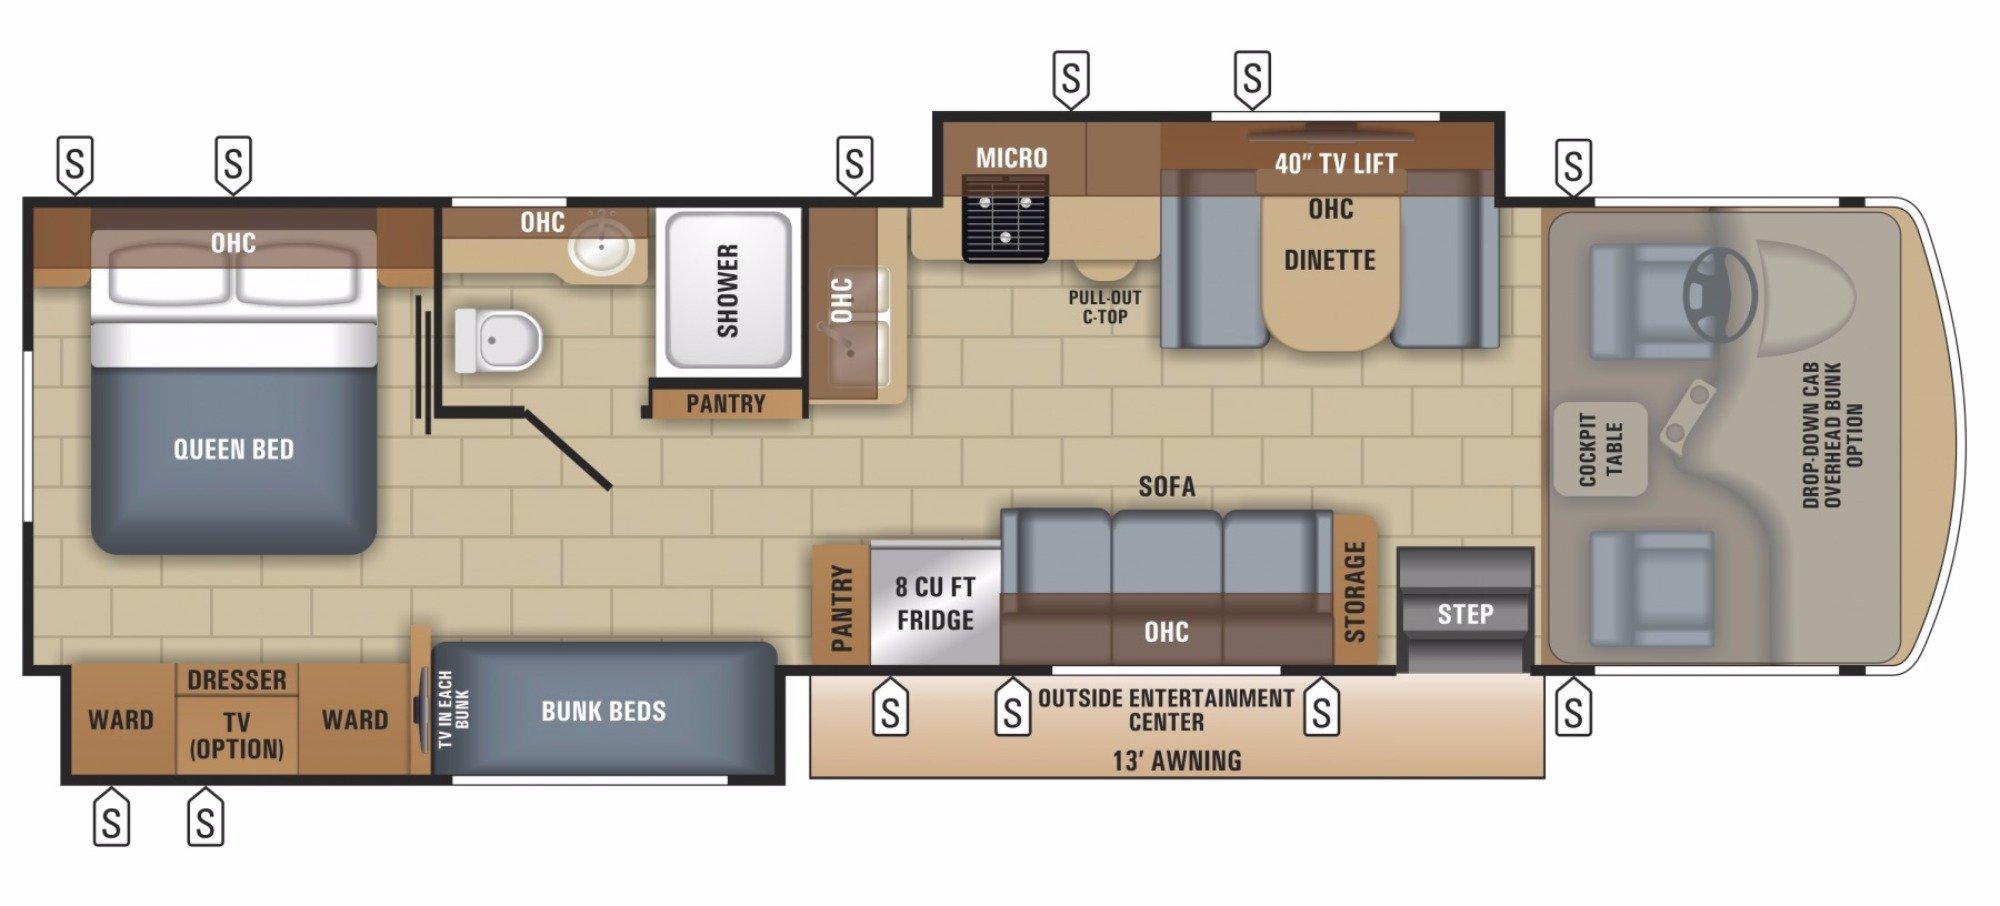 View Floor Plan for 2018 JAYCO ALANTE 31R